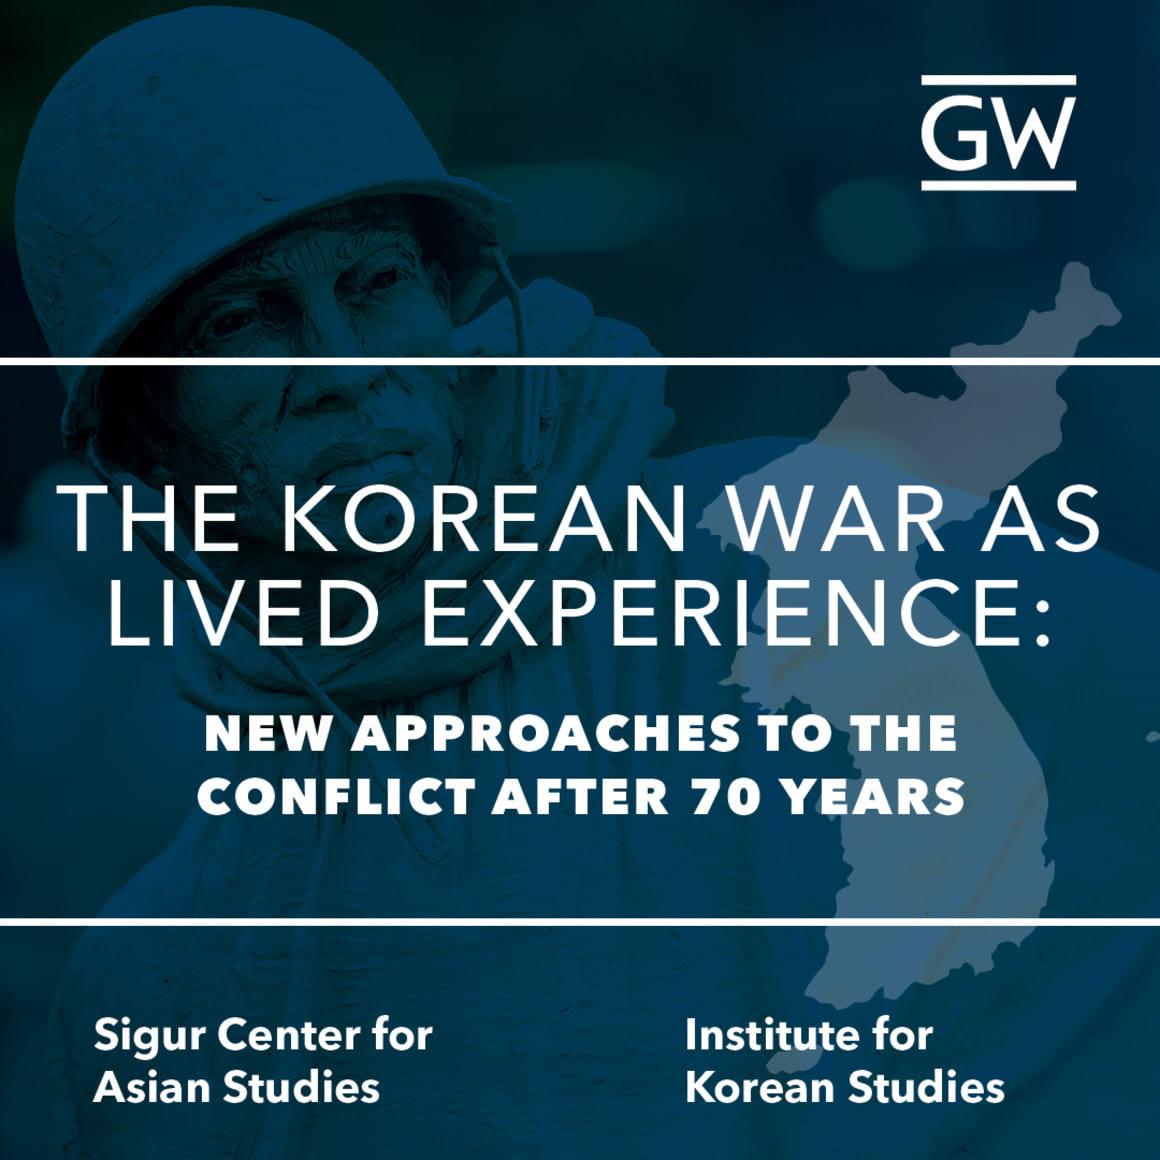 Blue square with Korean War memorial statue, Korean peninsula, and text